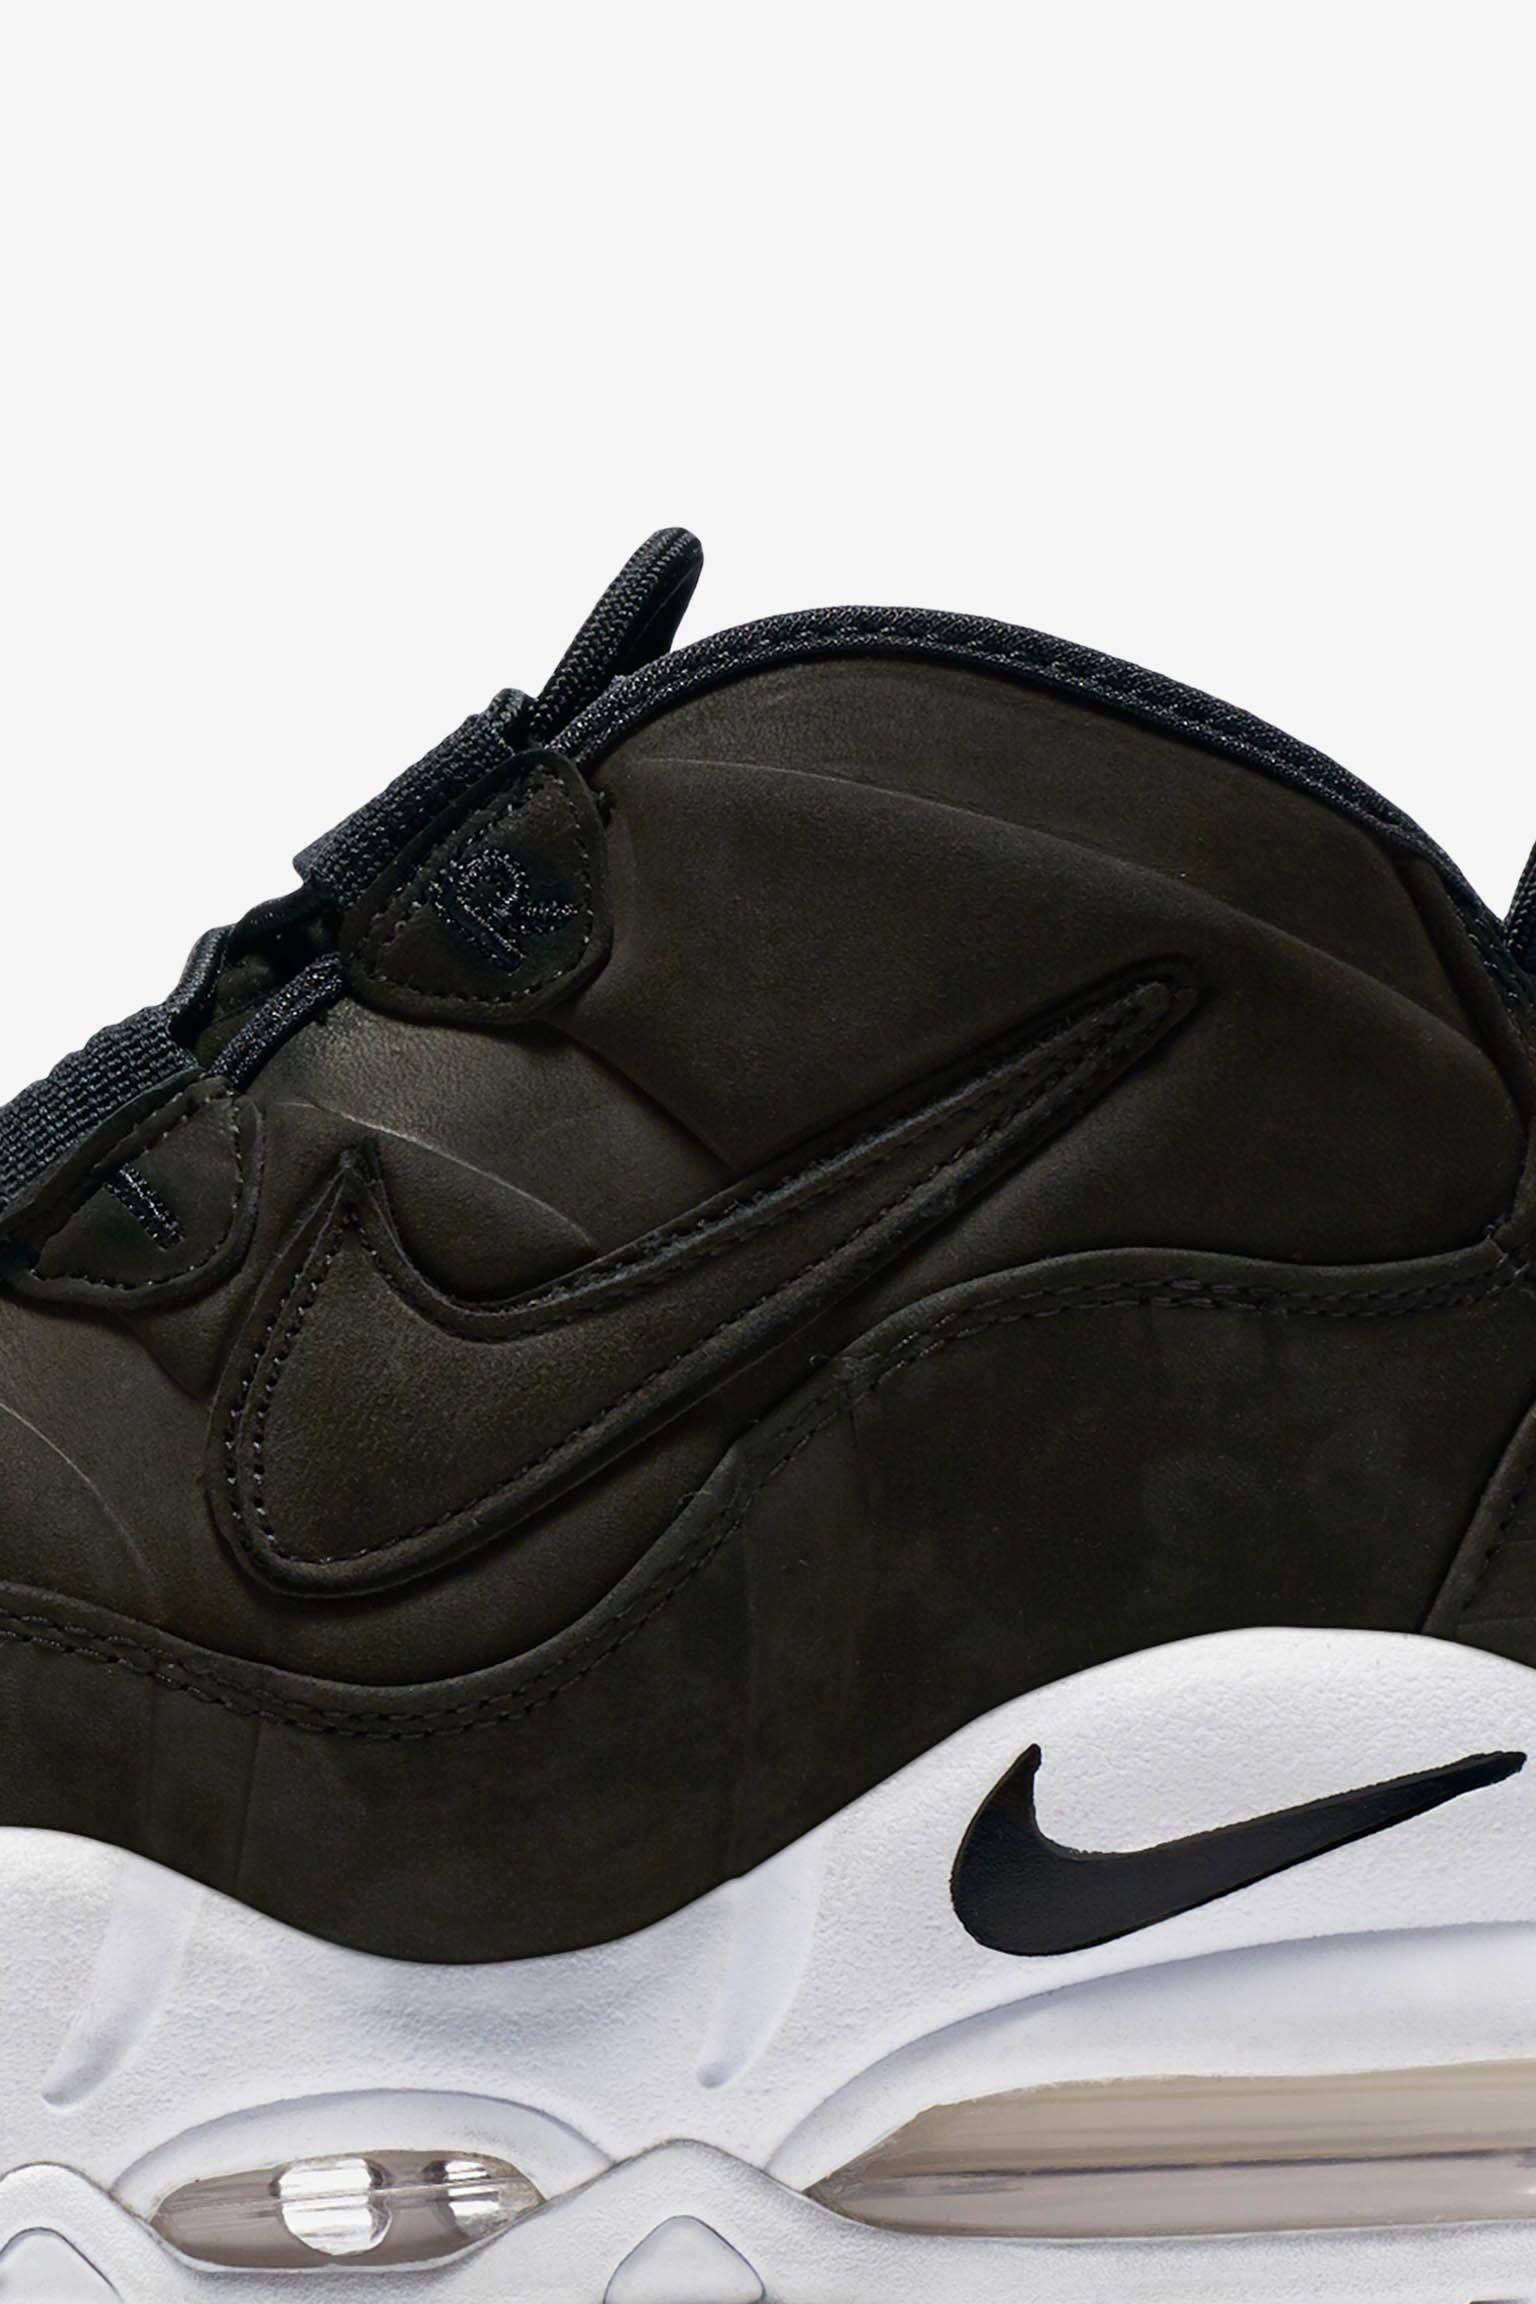 Nike Max Uptempo 'Black & White'